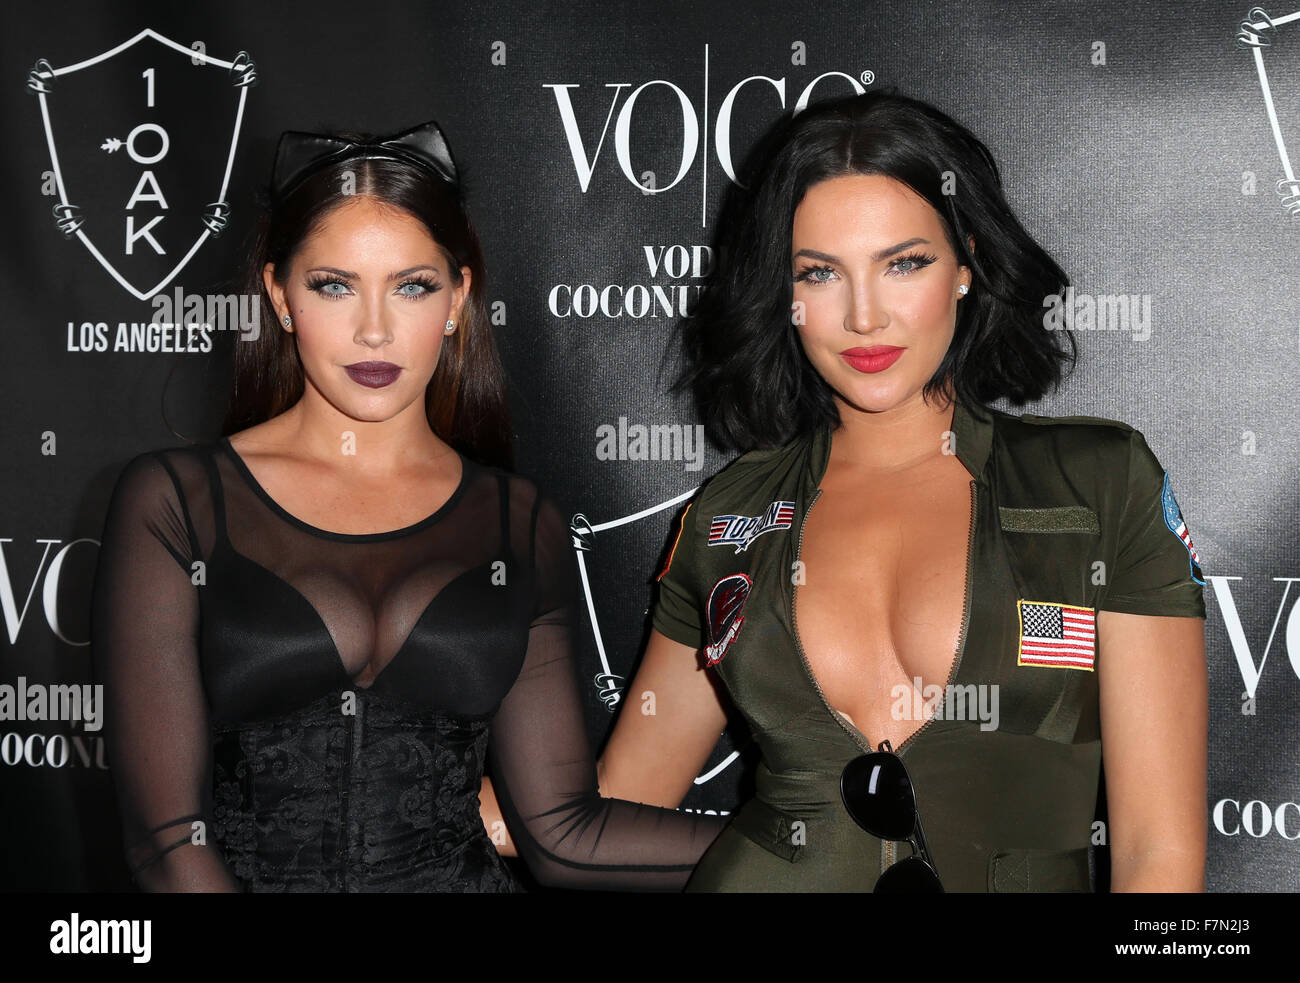 VO|CO presents Alessandra Ambrosio's Heaven and Hell Halloween ...